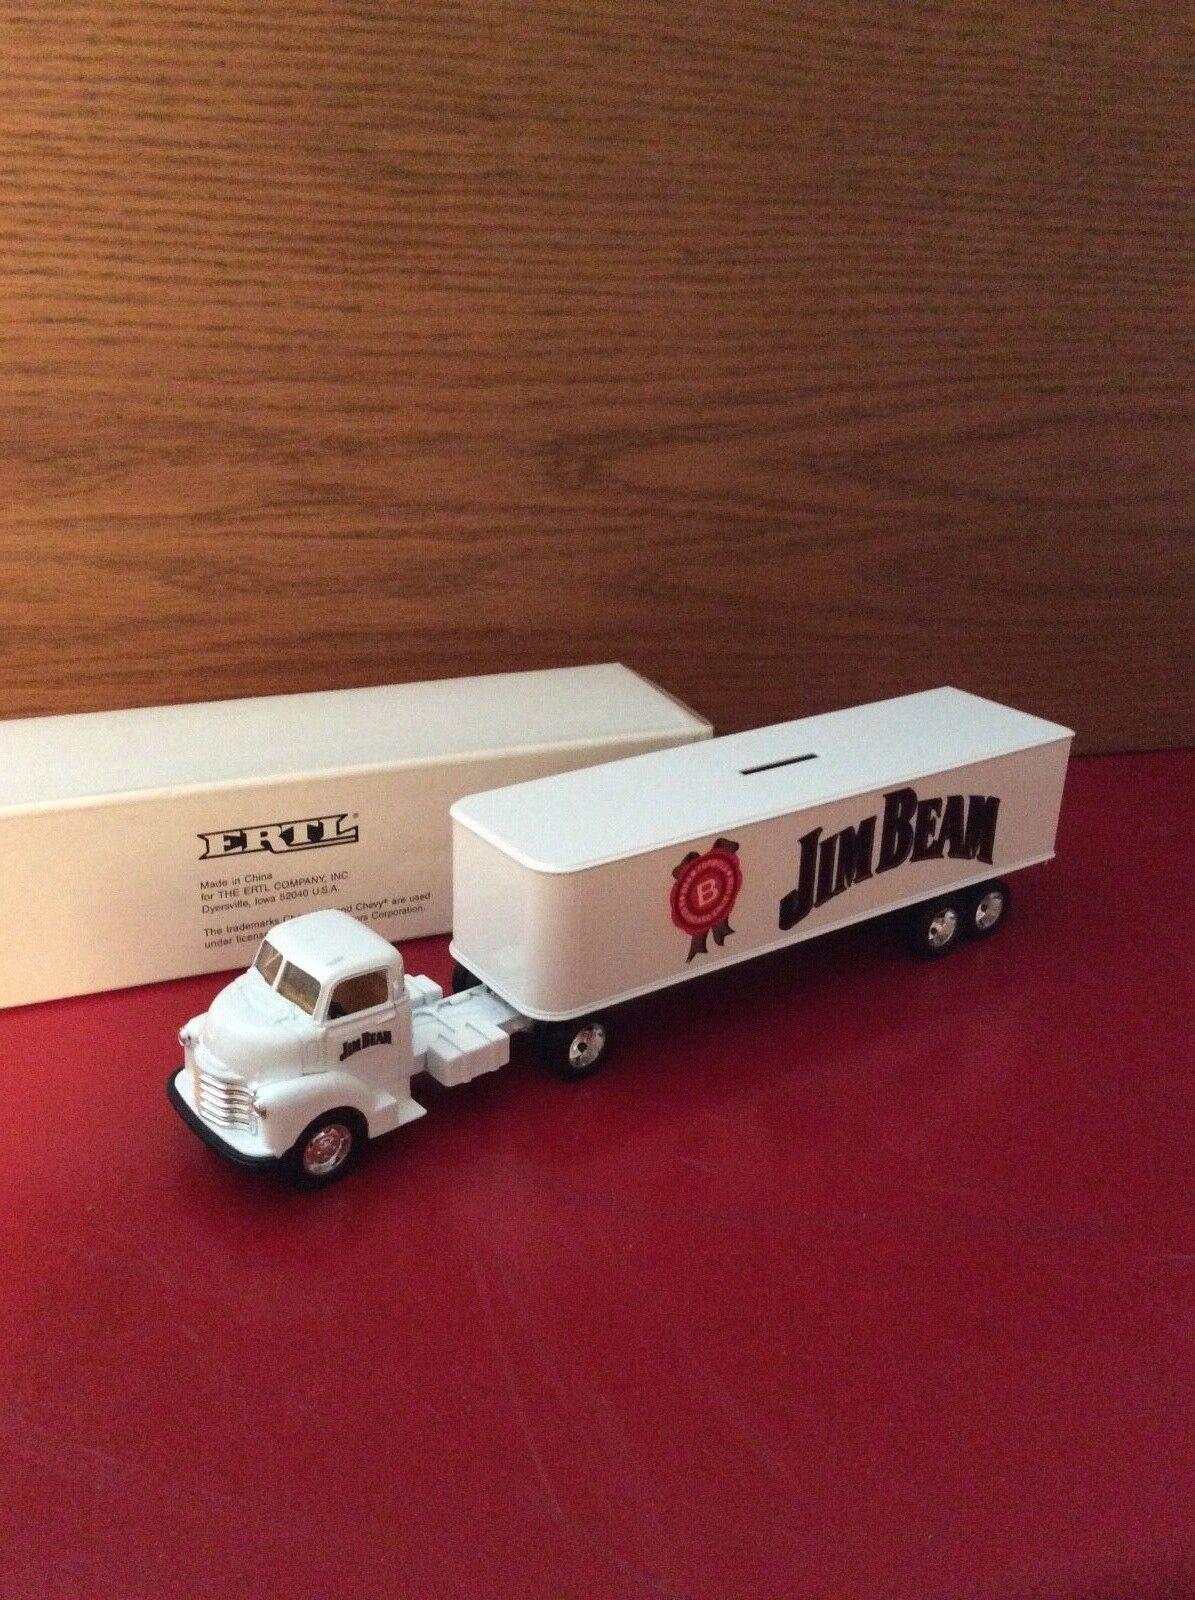 Ertl coe 1950 Chevy come tractor trailer Jim Beam   1 43 O Scale